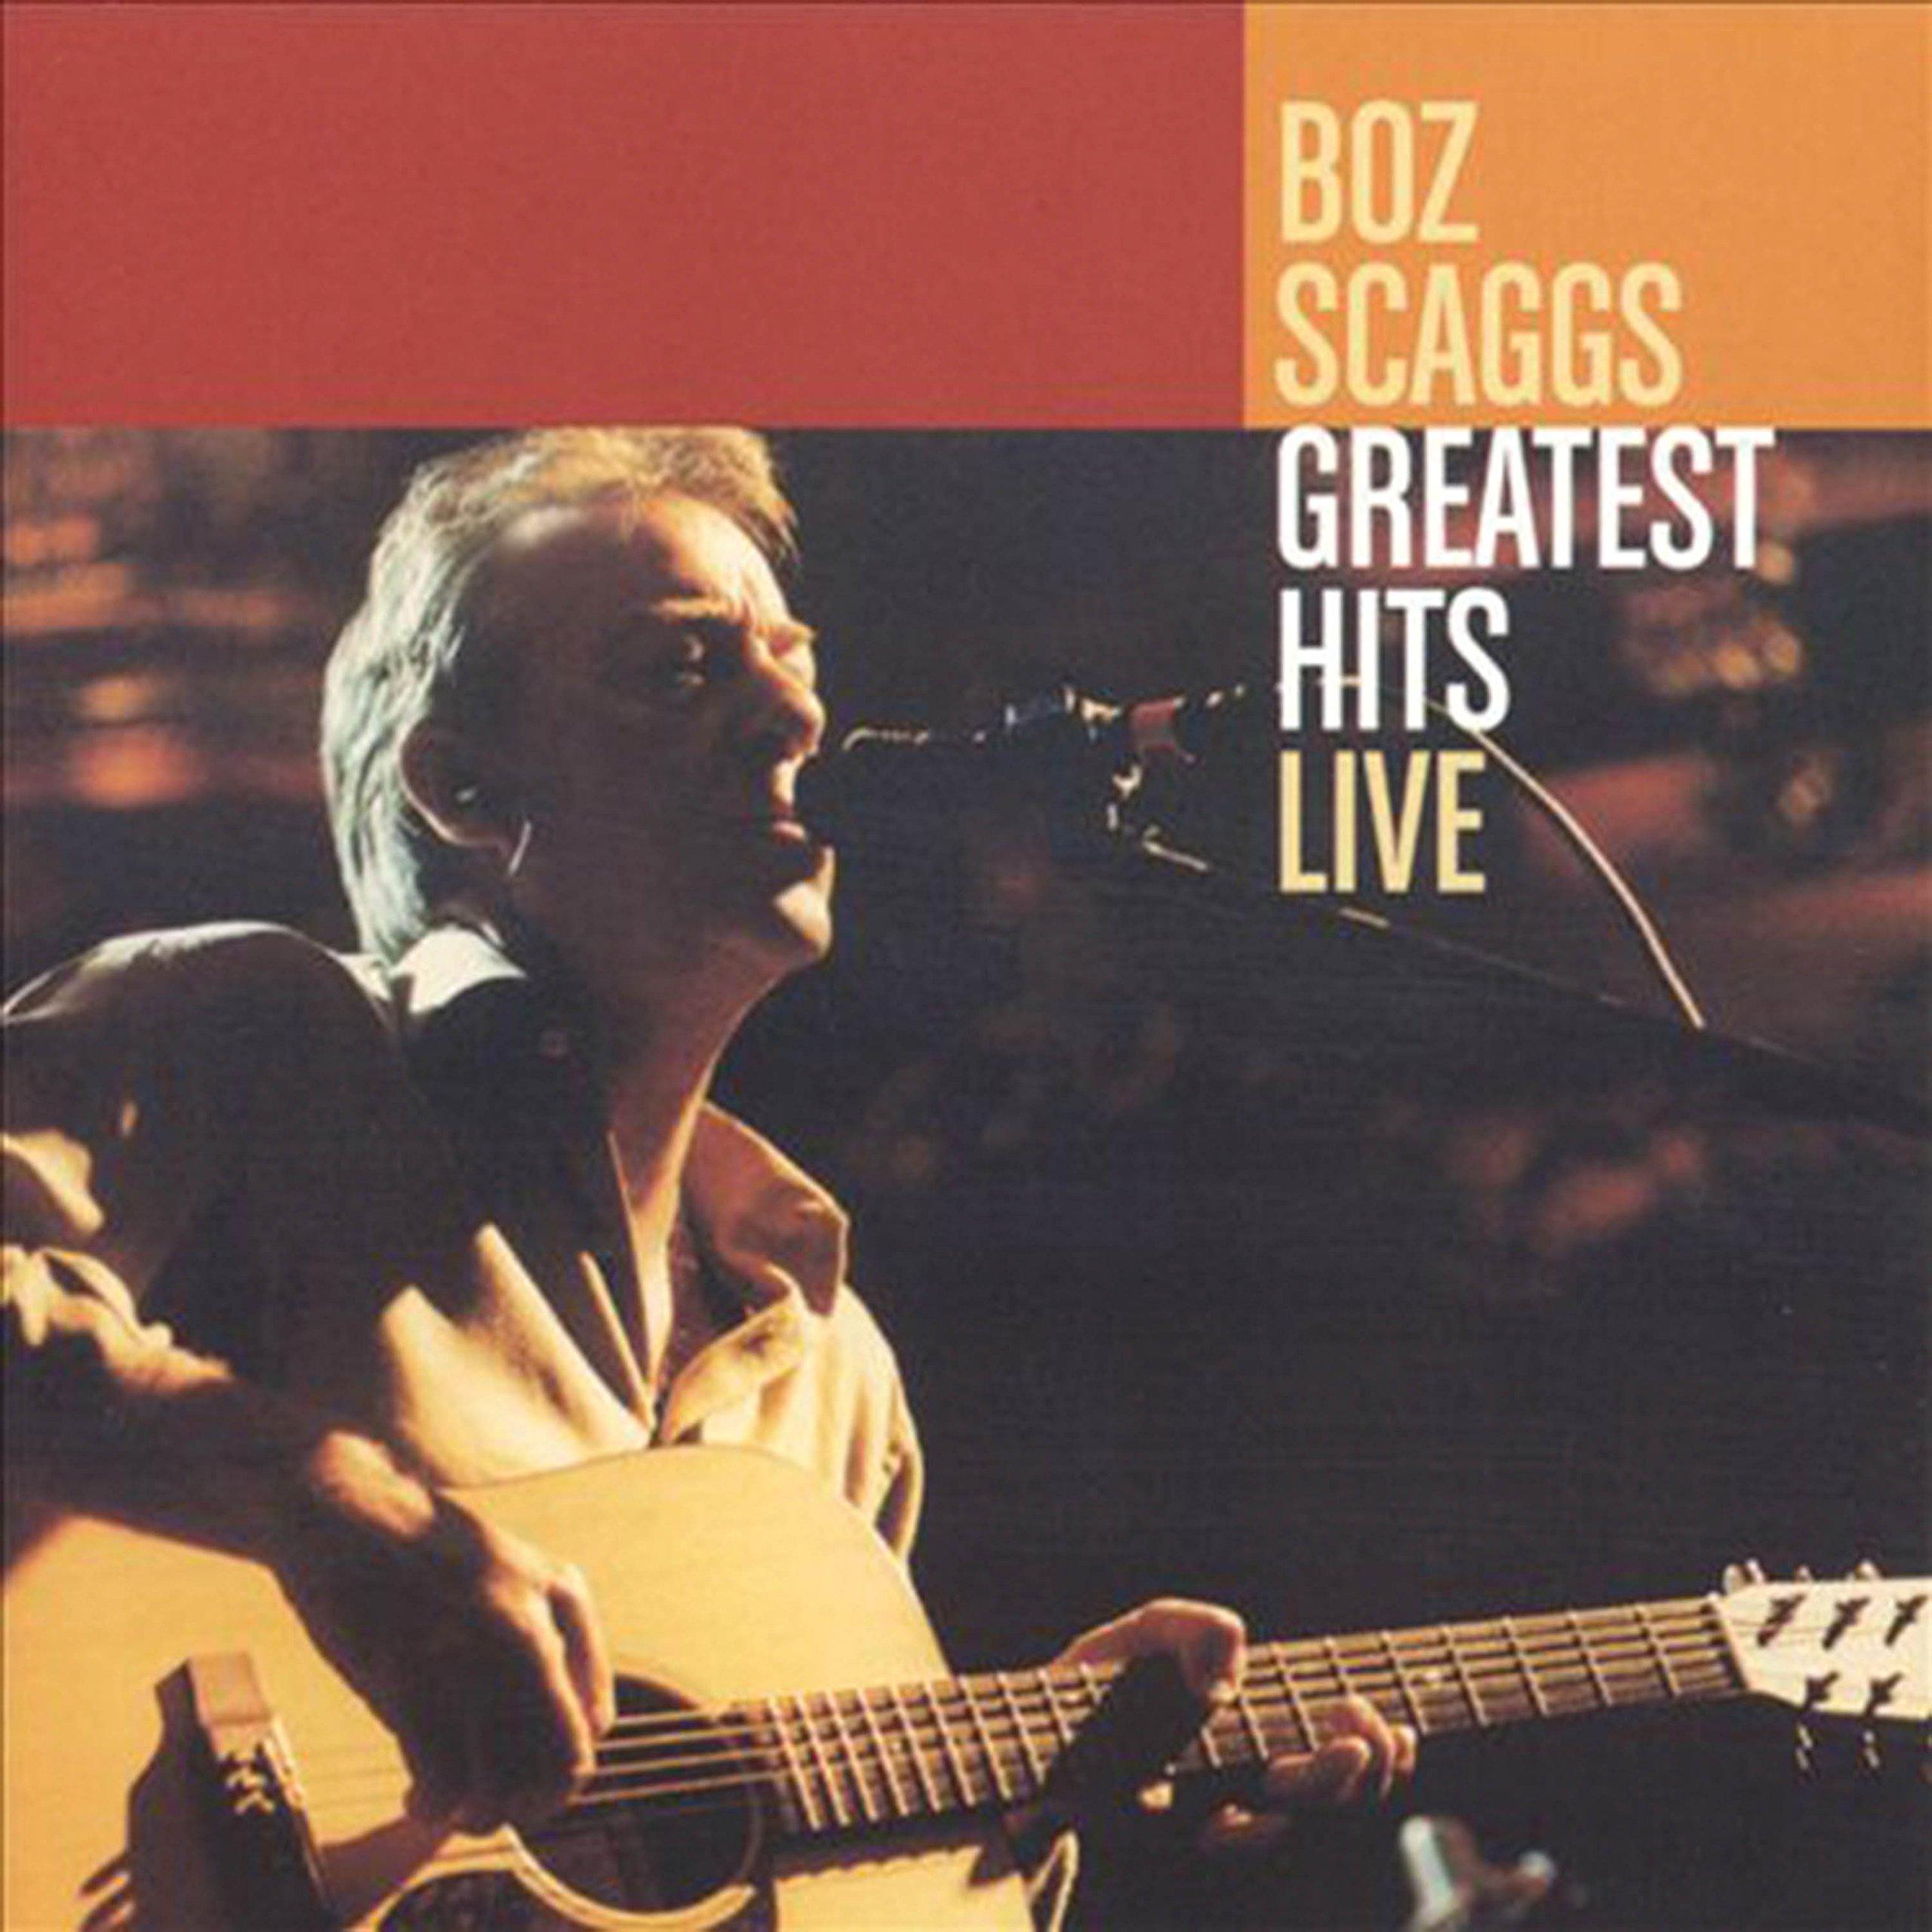 Vinilo : Boz Scaggs - Greatest Hits Live (LP Vinyl)